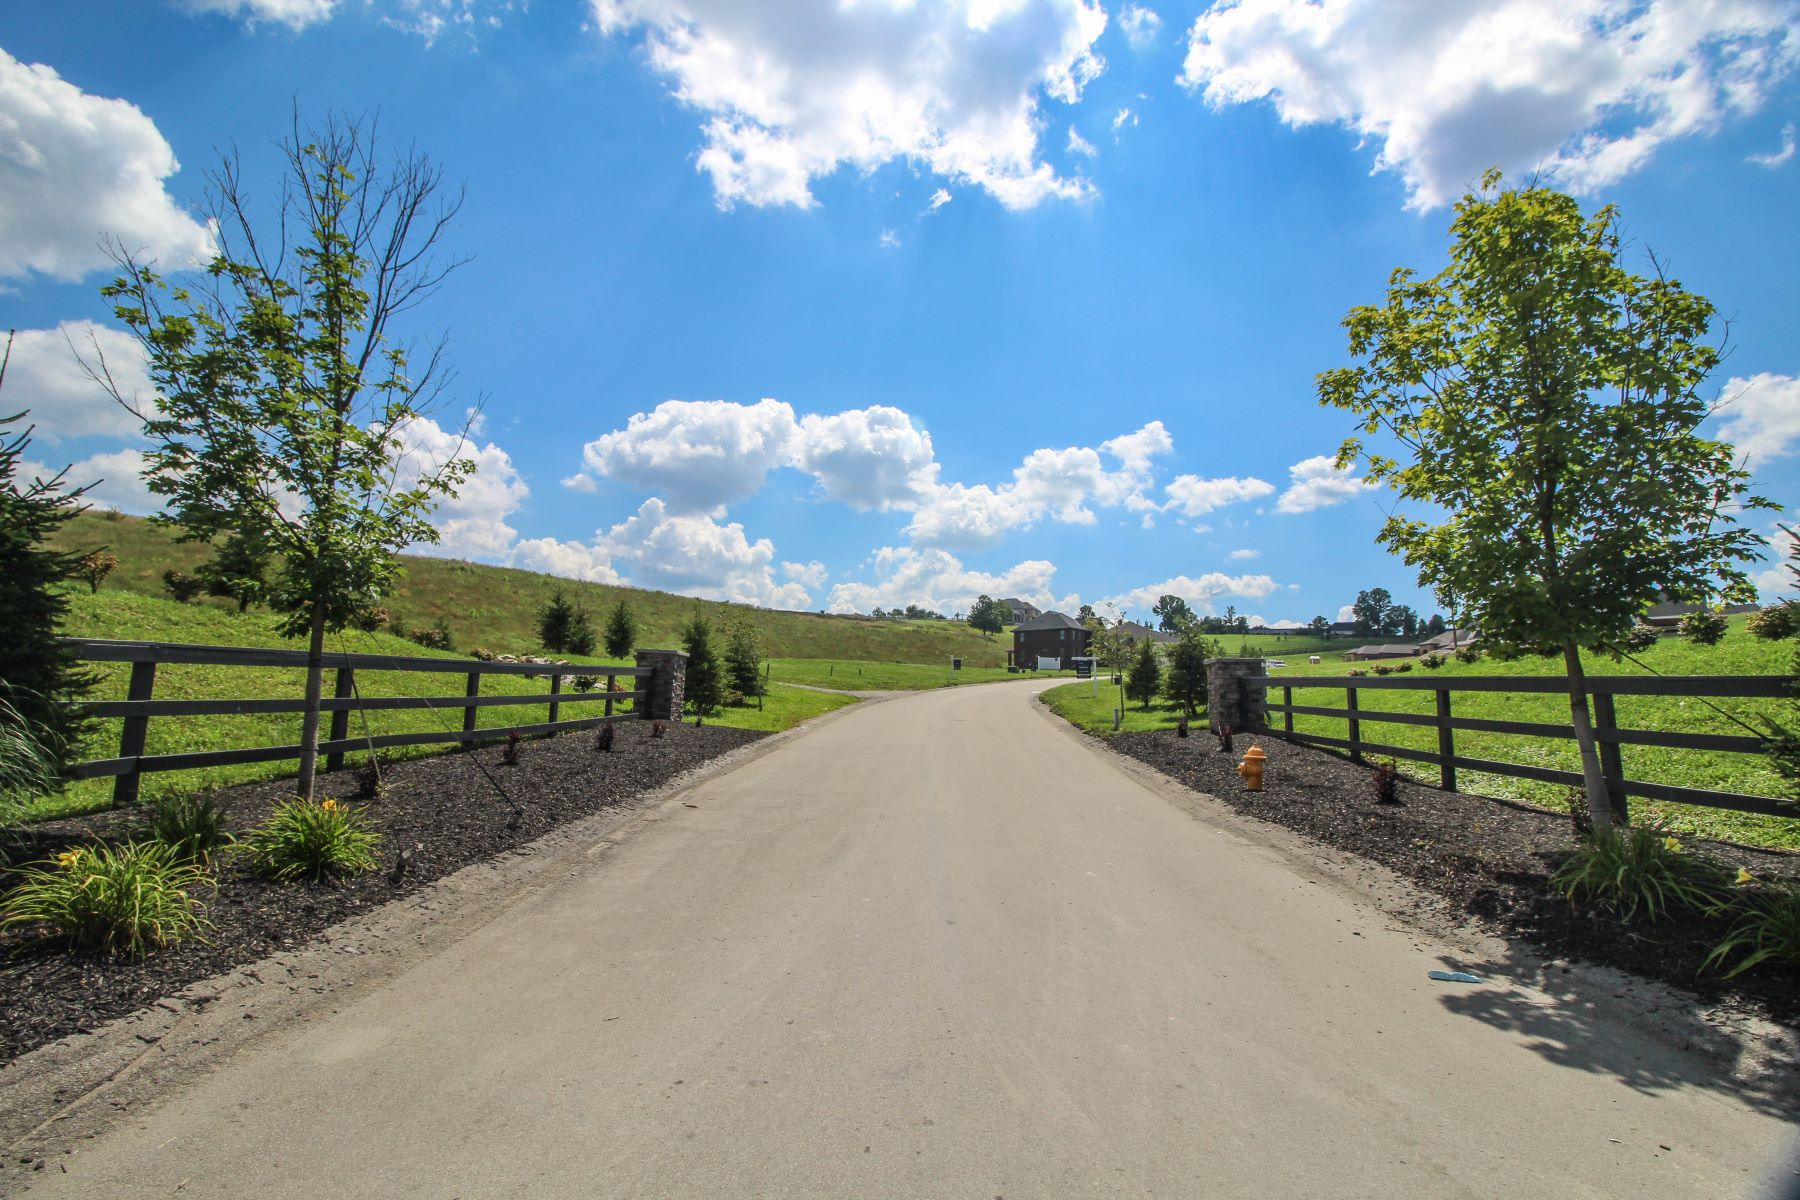 Additional photo for property listing at Piatt Estates Home Site - Lot 108R 103 Piatt Estates Drive Lot 108R Washington, Pennsylvania 15301 United States